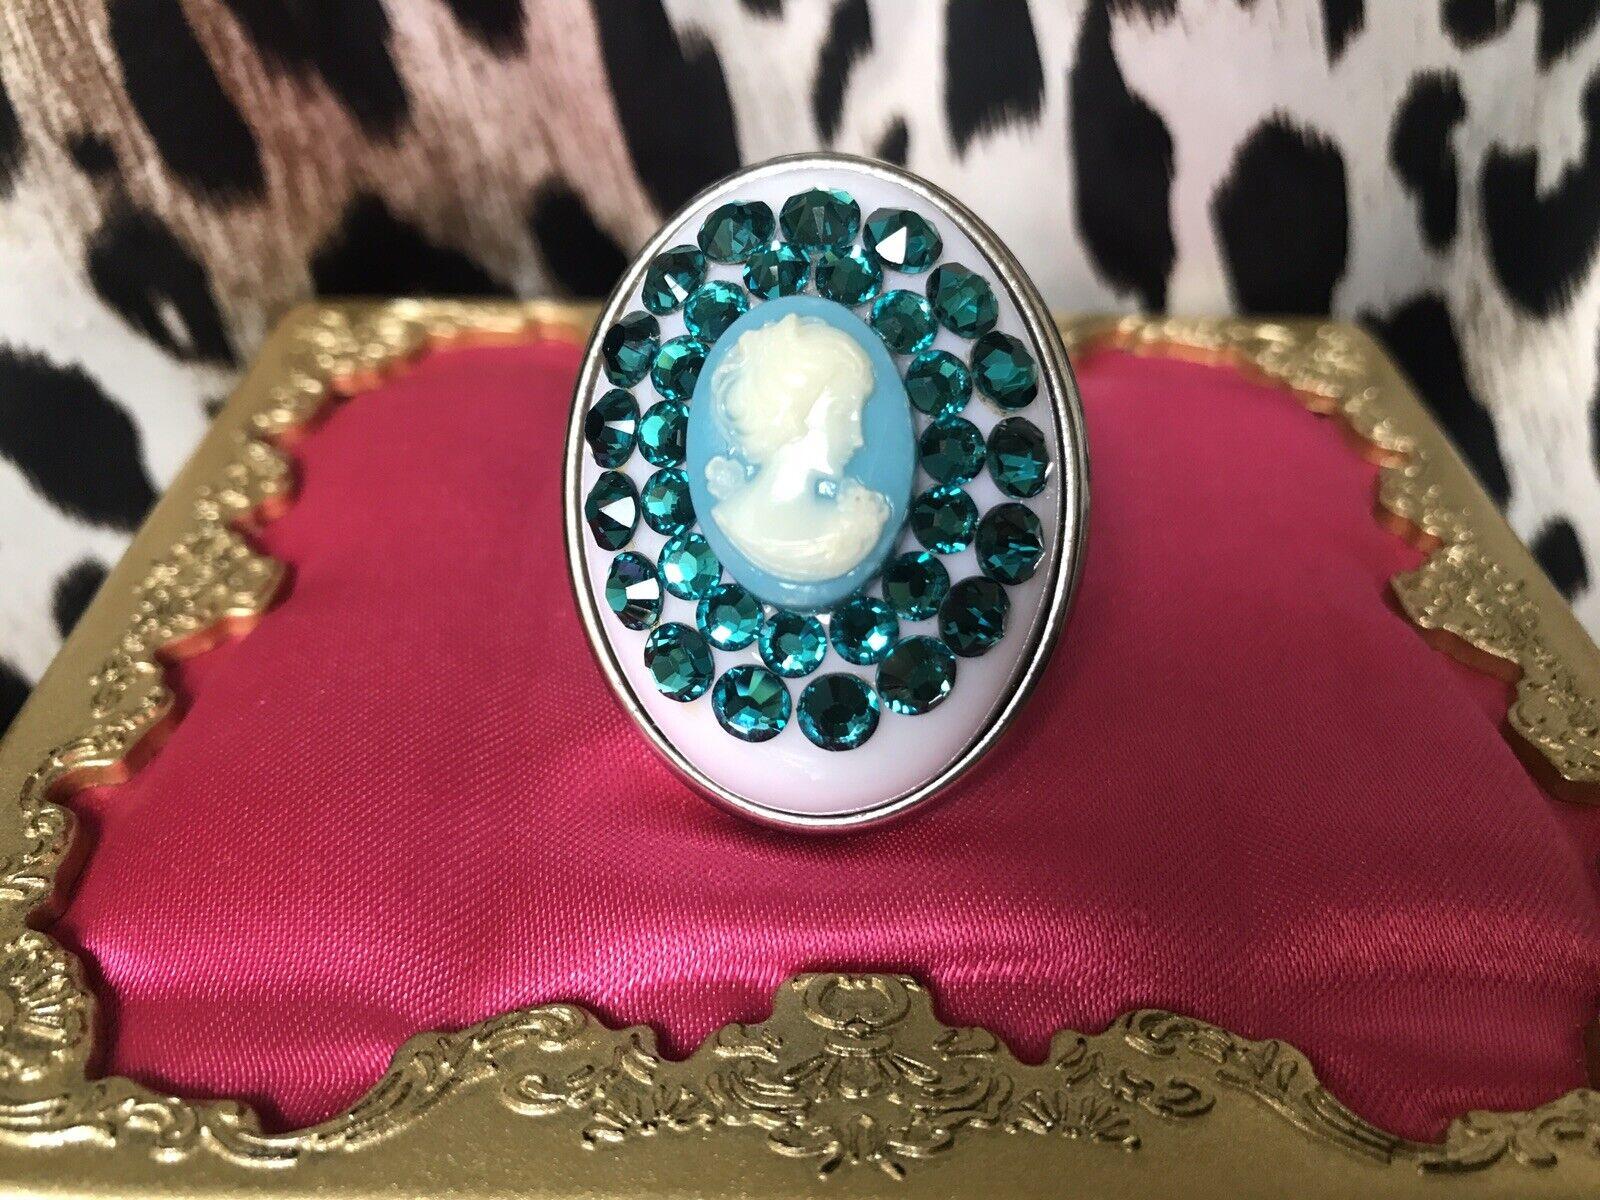 Tarina Tarantino HUGE Electro Cameo Teal bluee Crystal SPARKLY Swarovski Ring